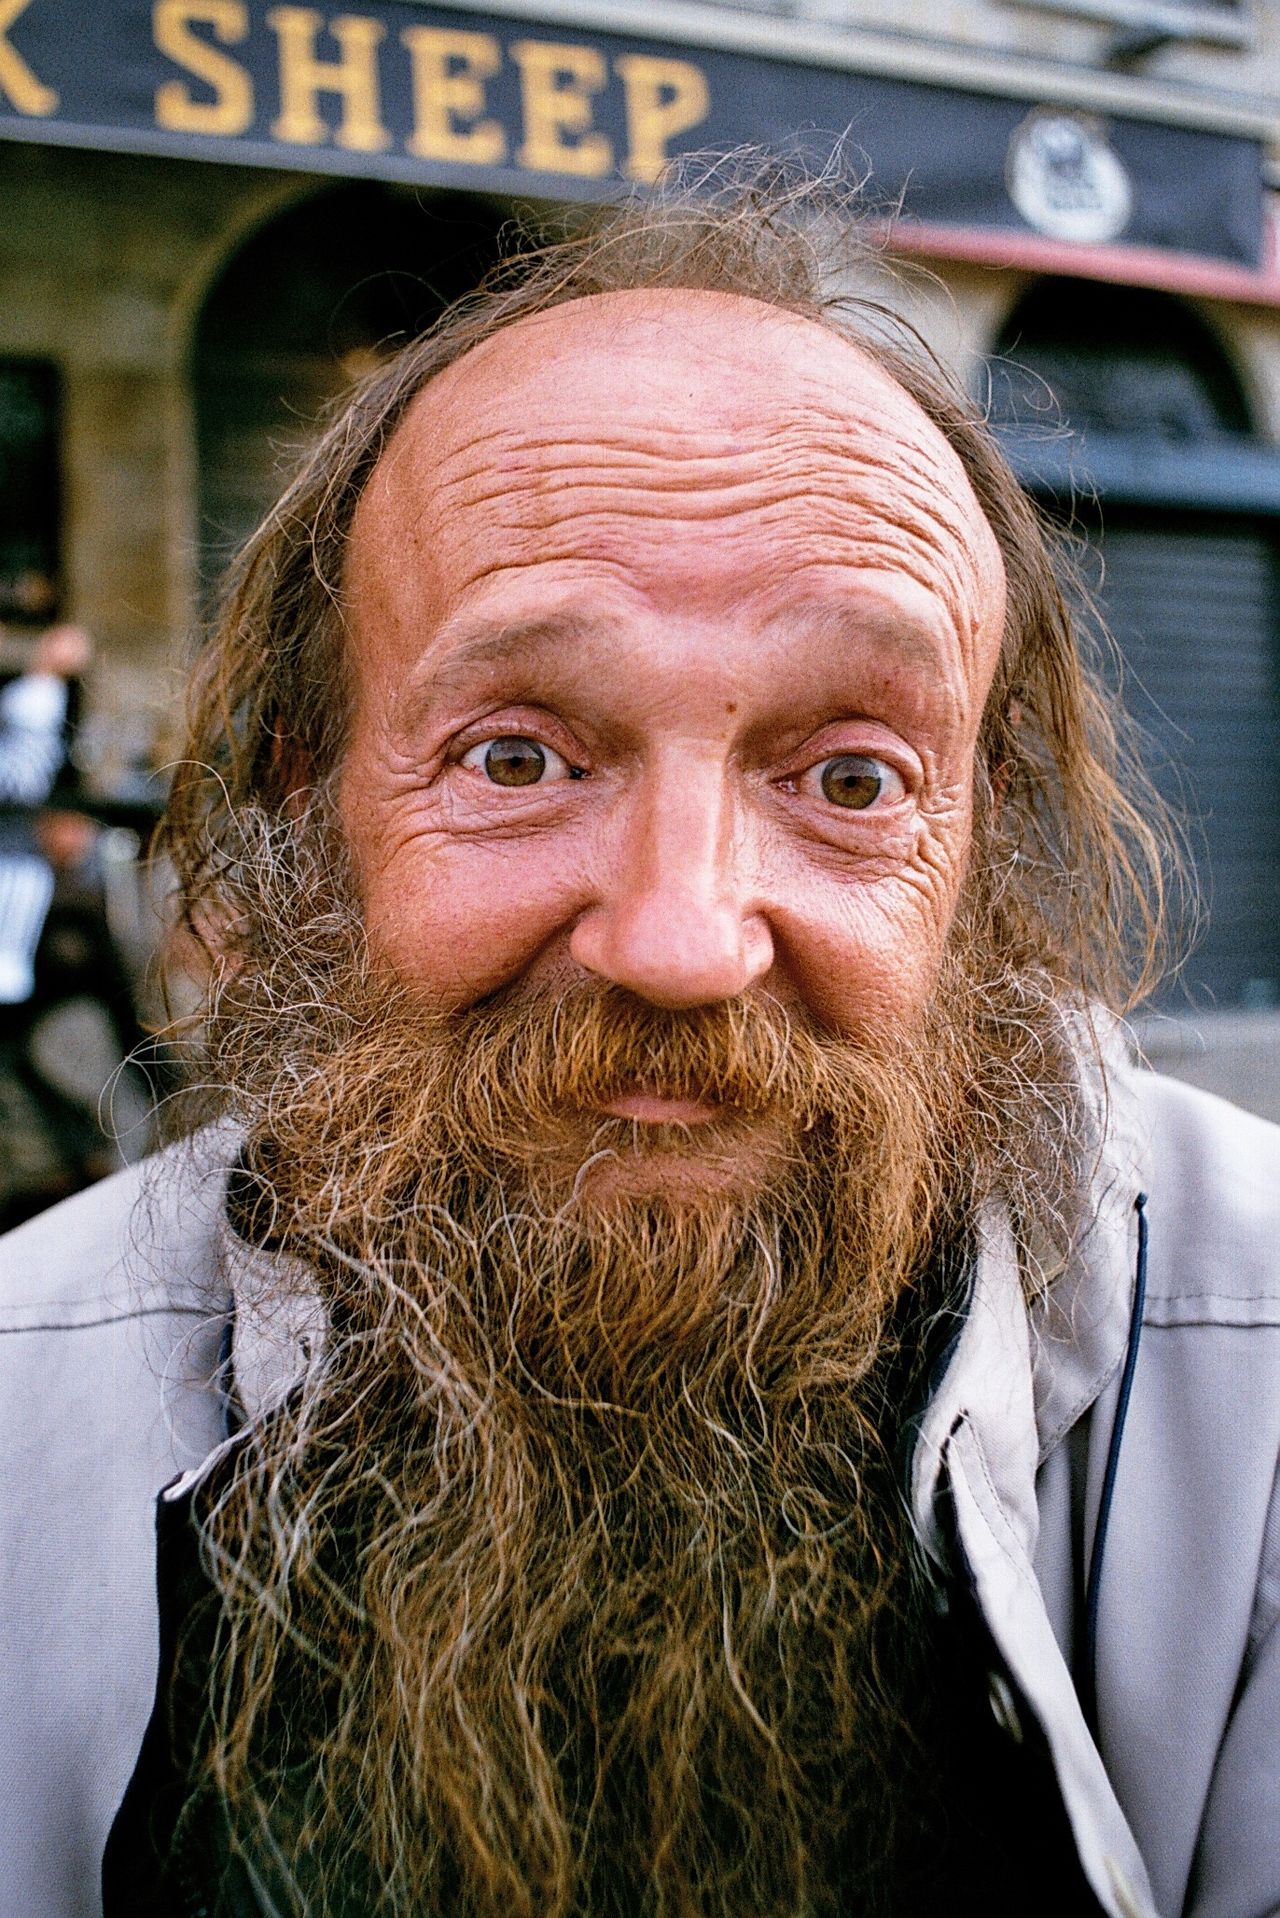 35mm Film Analogue Photography Filmisnotdead First Eyeem Photo Homeless Ishootfilm Kodak Looking At Camera Nikon Portrait Street Photography Streetphotography